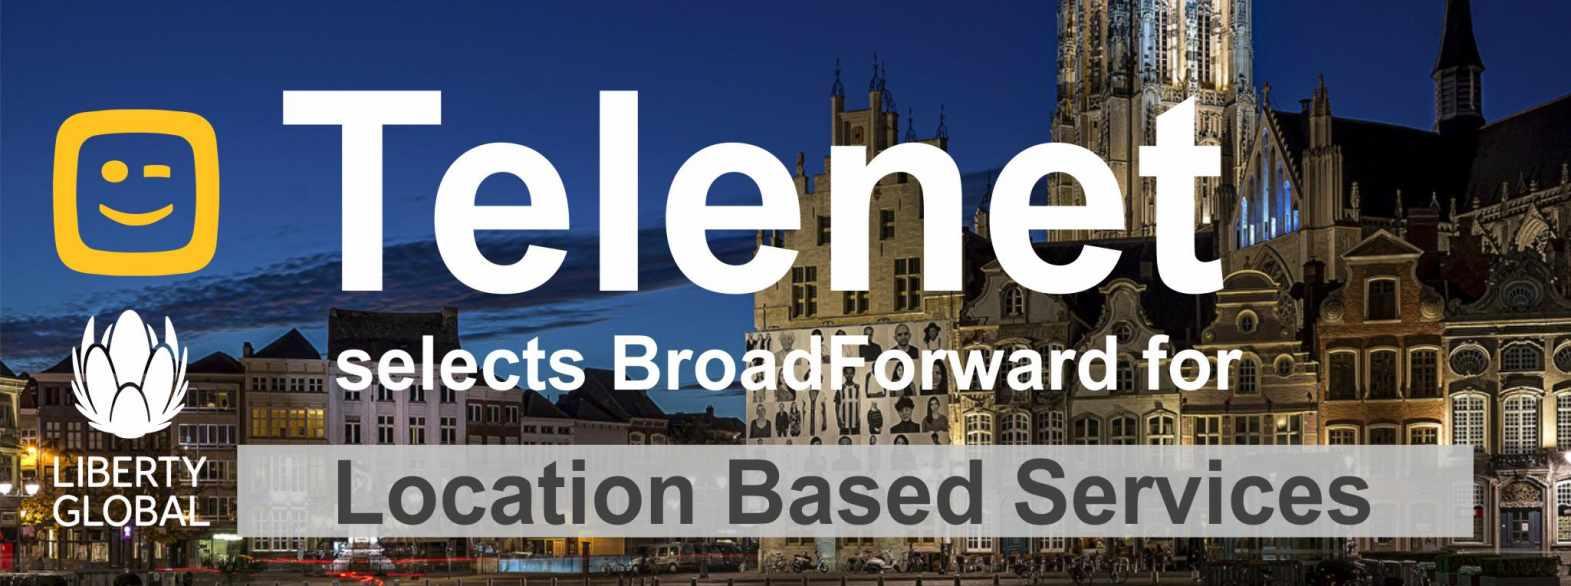 Telenet selects BroadForward LBS2019